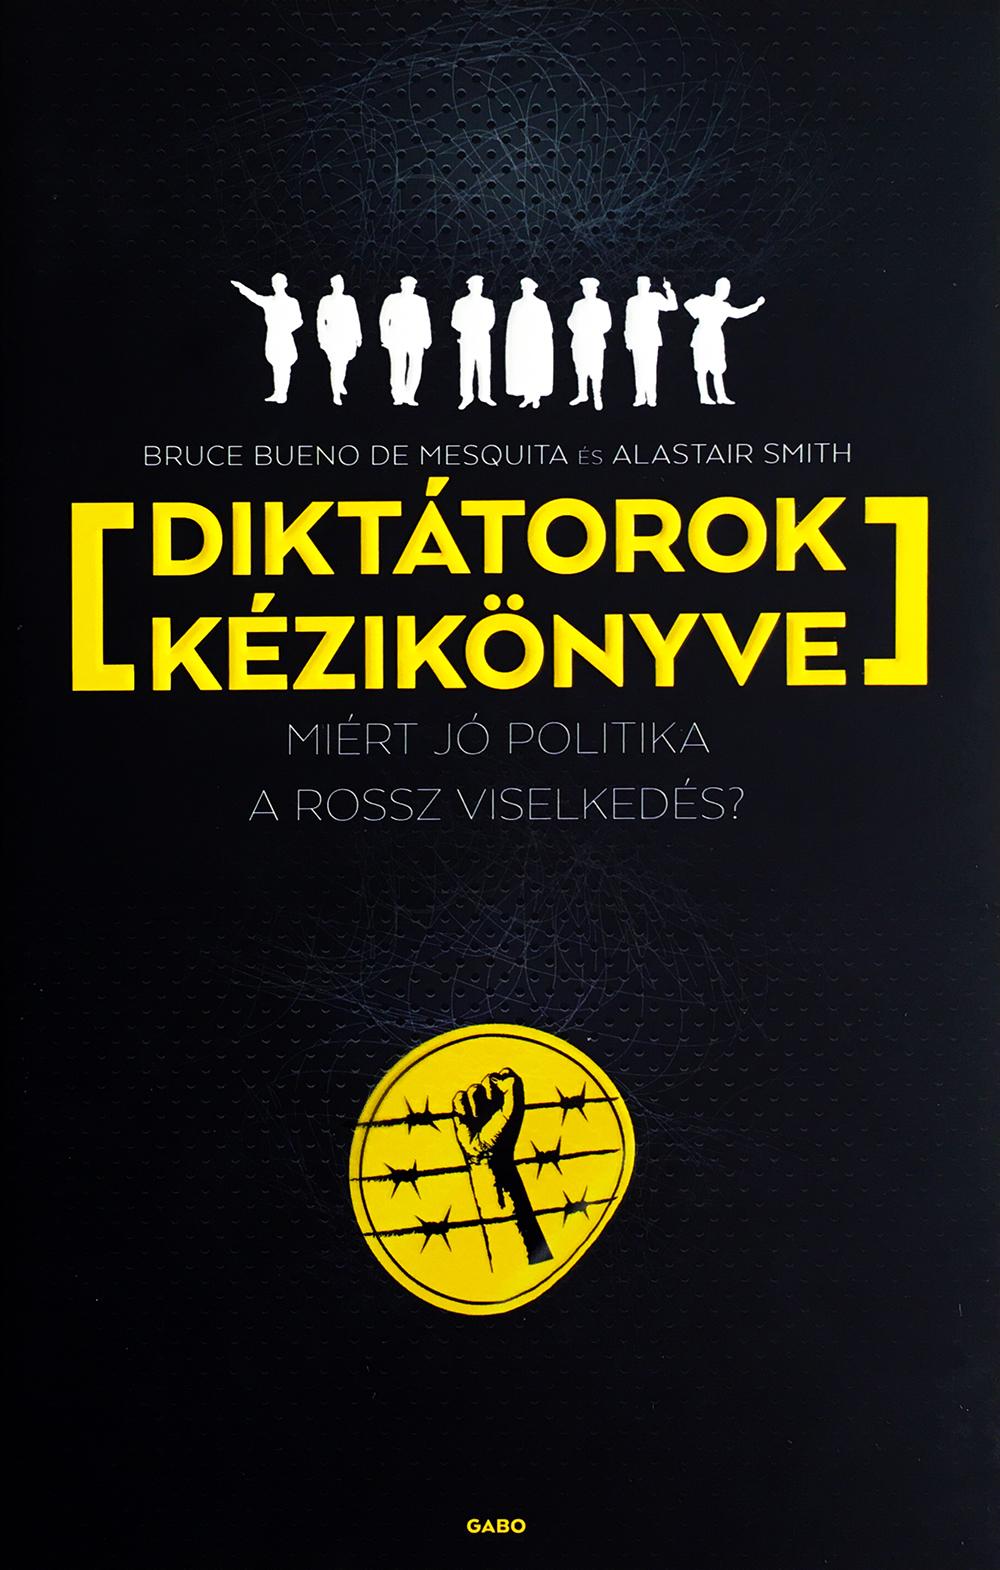 diktatorok-kezikonyve00.JPG